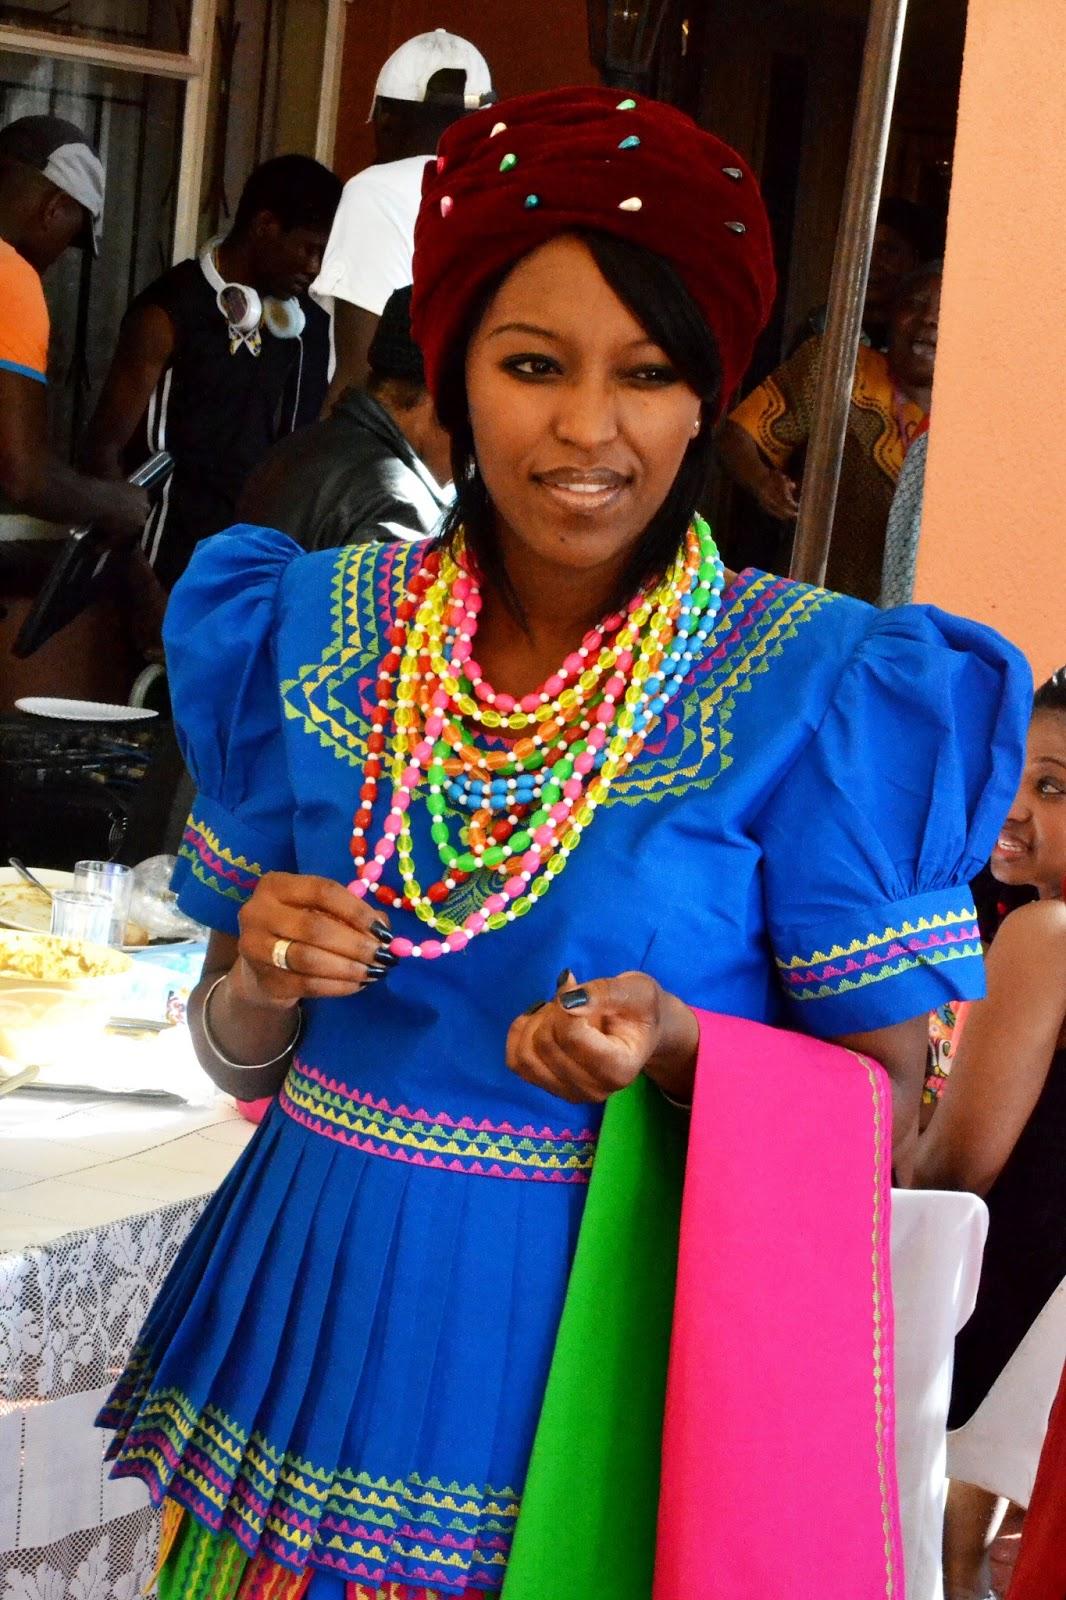 DSC 0183 - Traditional Wedding Attire For Bridesmaids